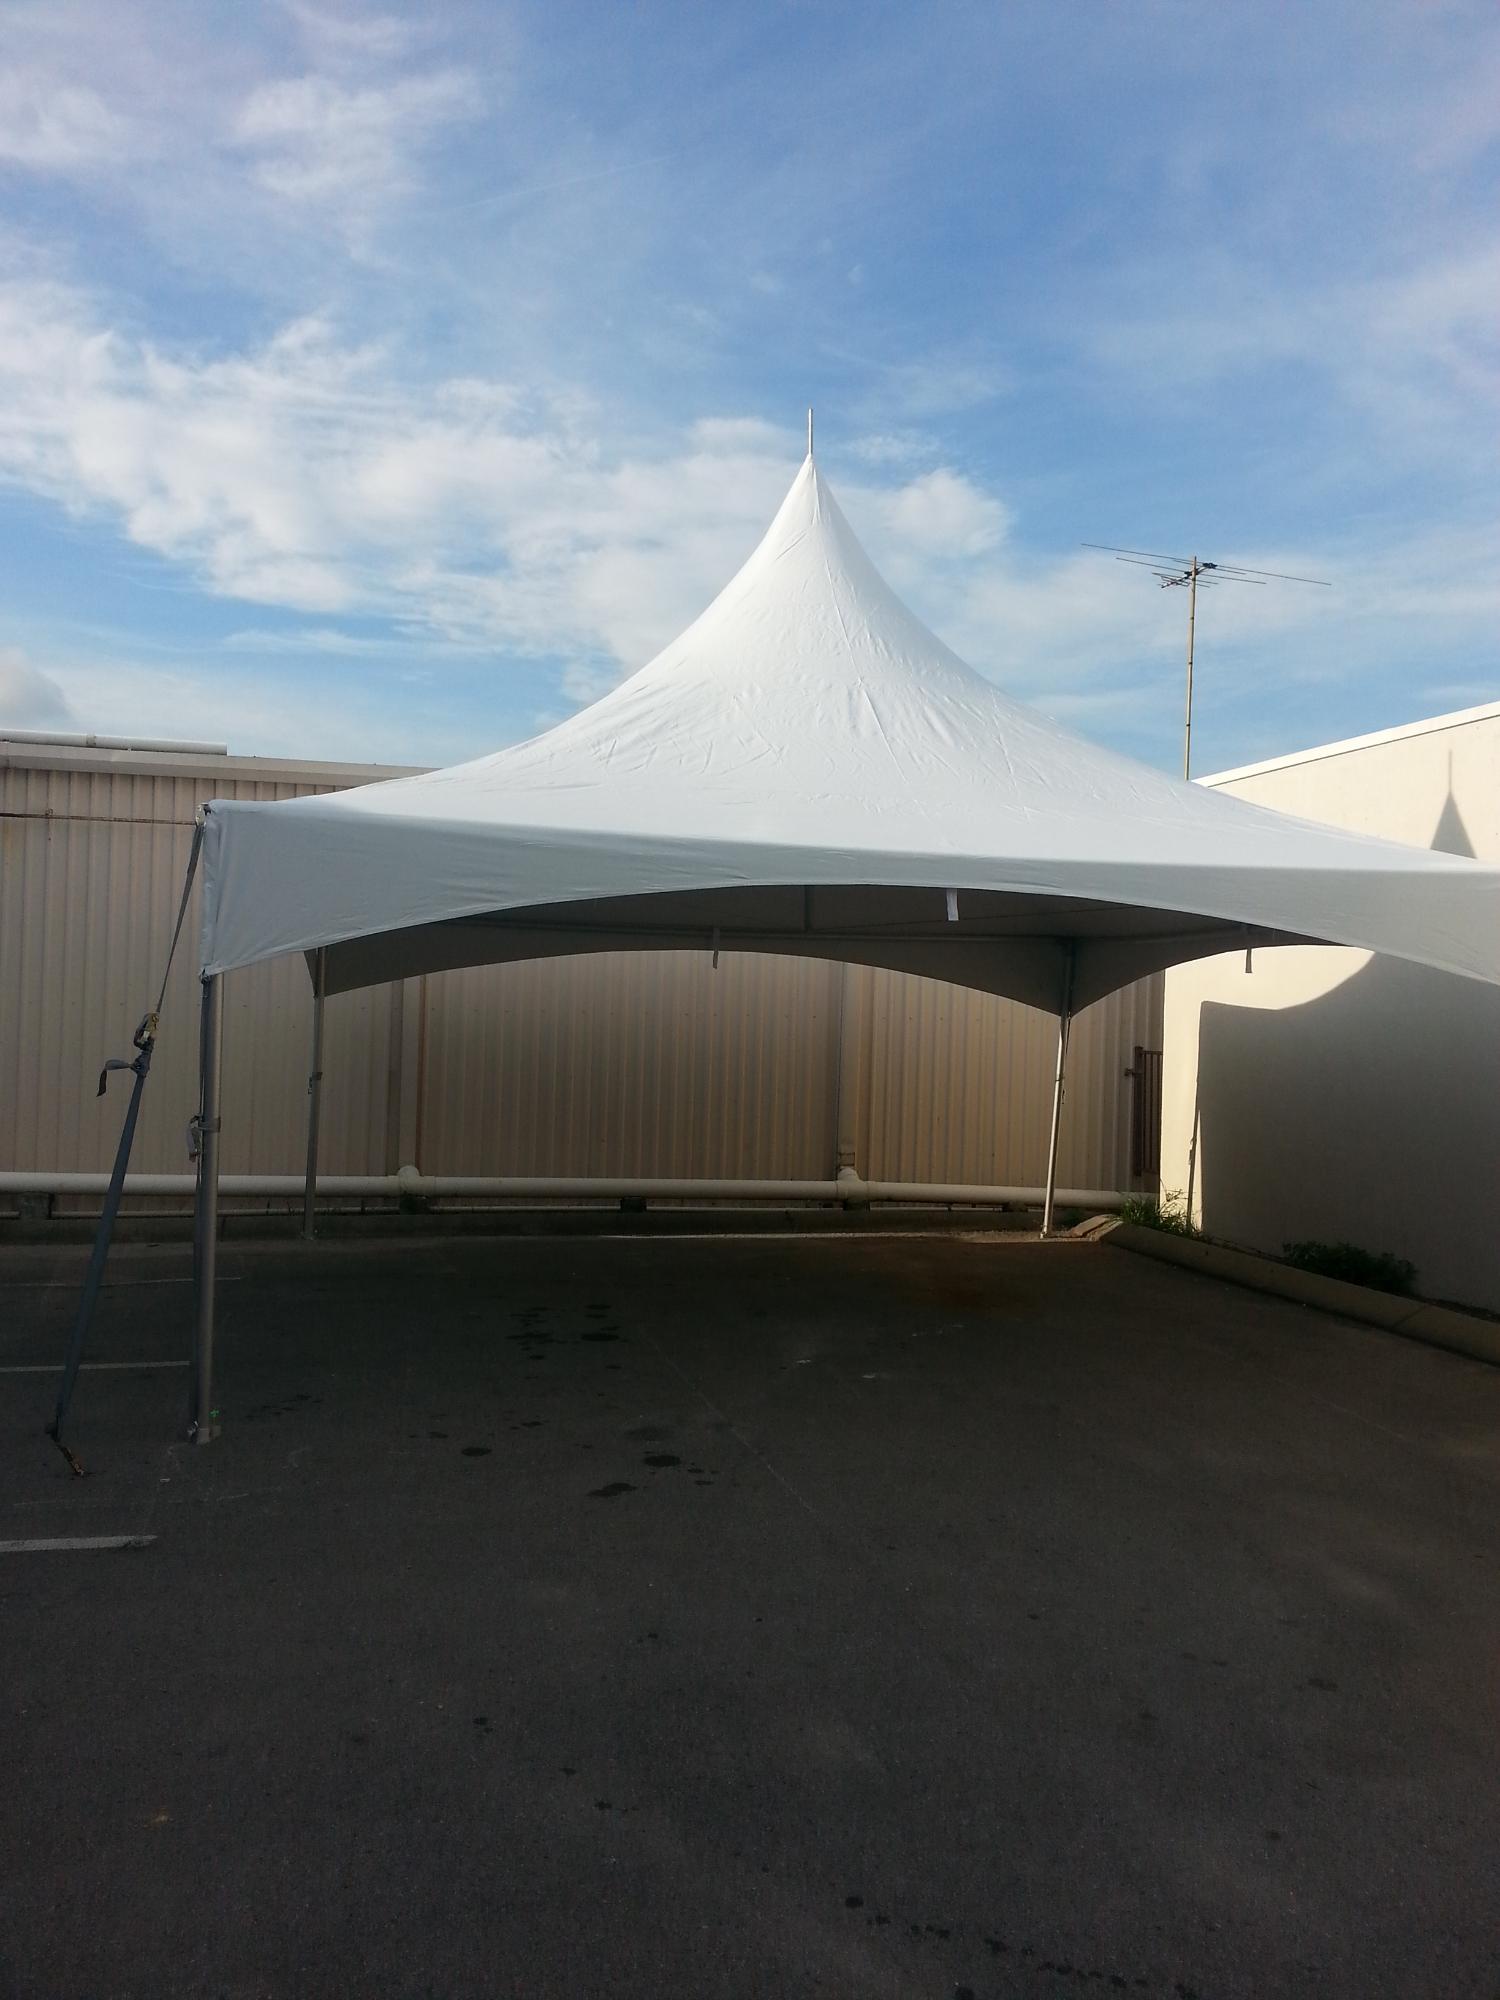 Party Tent Rentals Nashville Tn Murfreesboro Tn Middle Tn